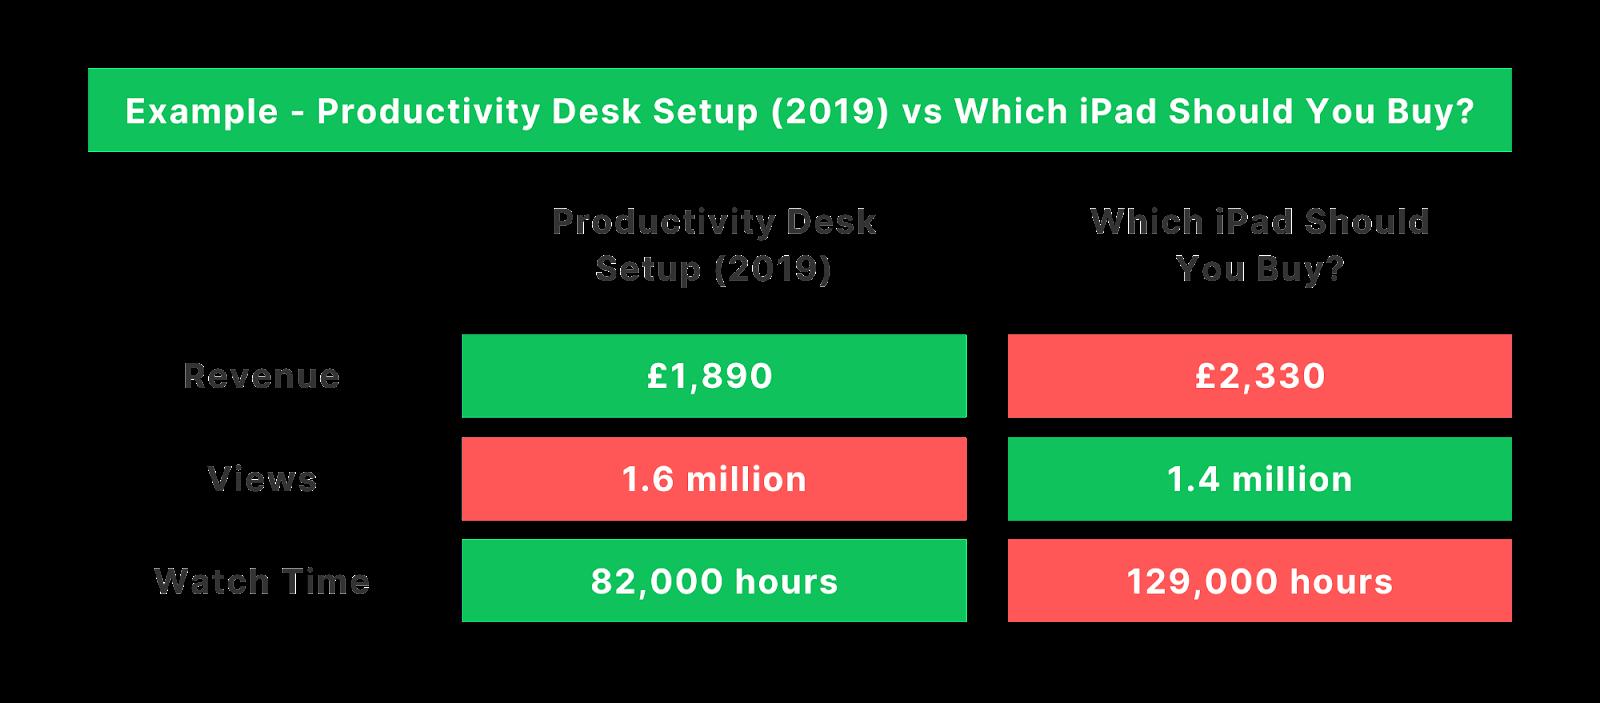 Productivity desk setup vs which ipad should you buy?